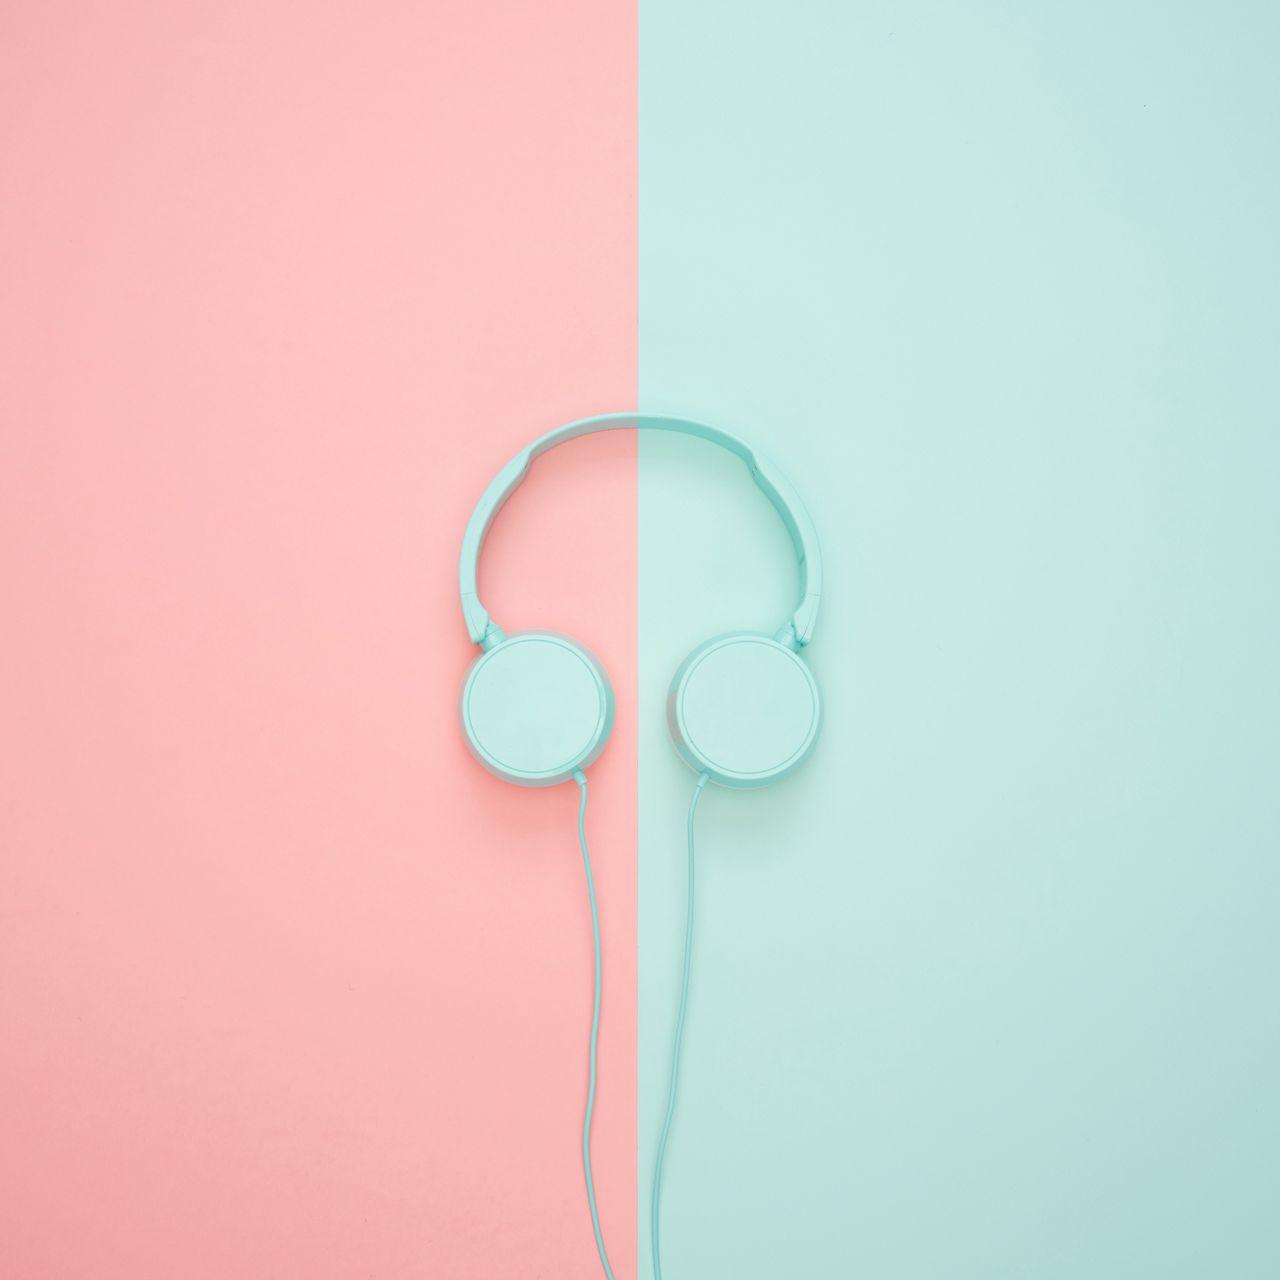 1280x1280 Wallpaper headphones, minimalism, pastel, pink